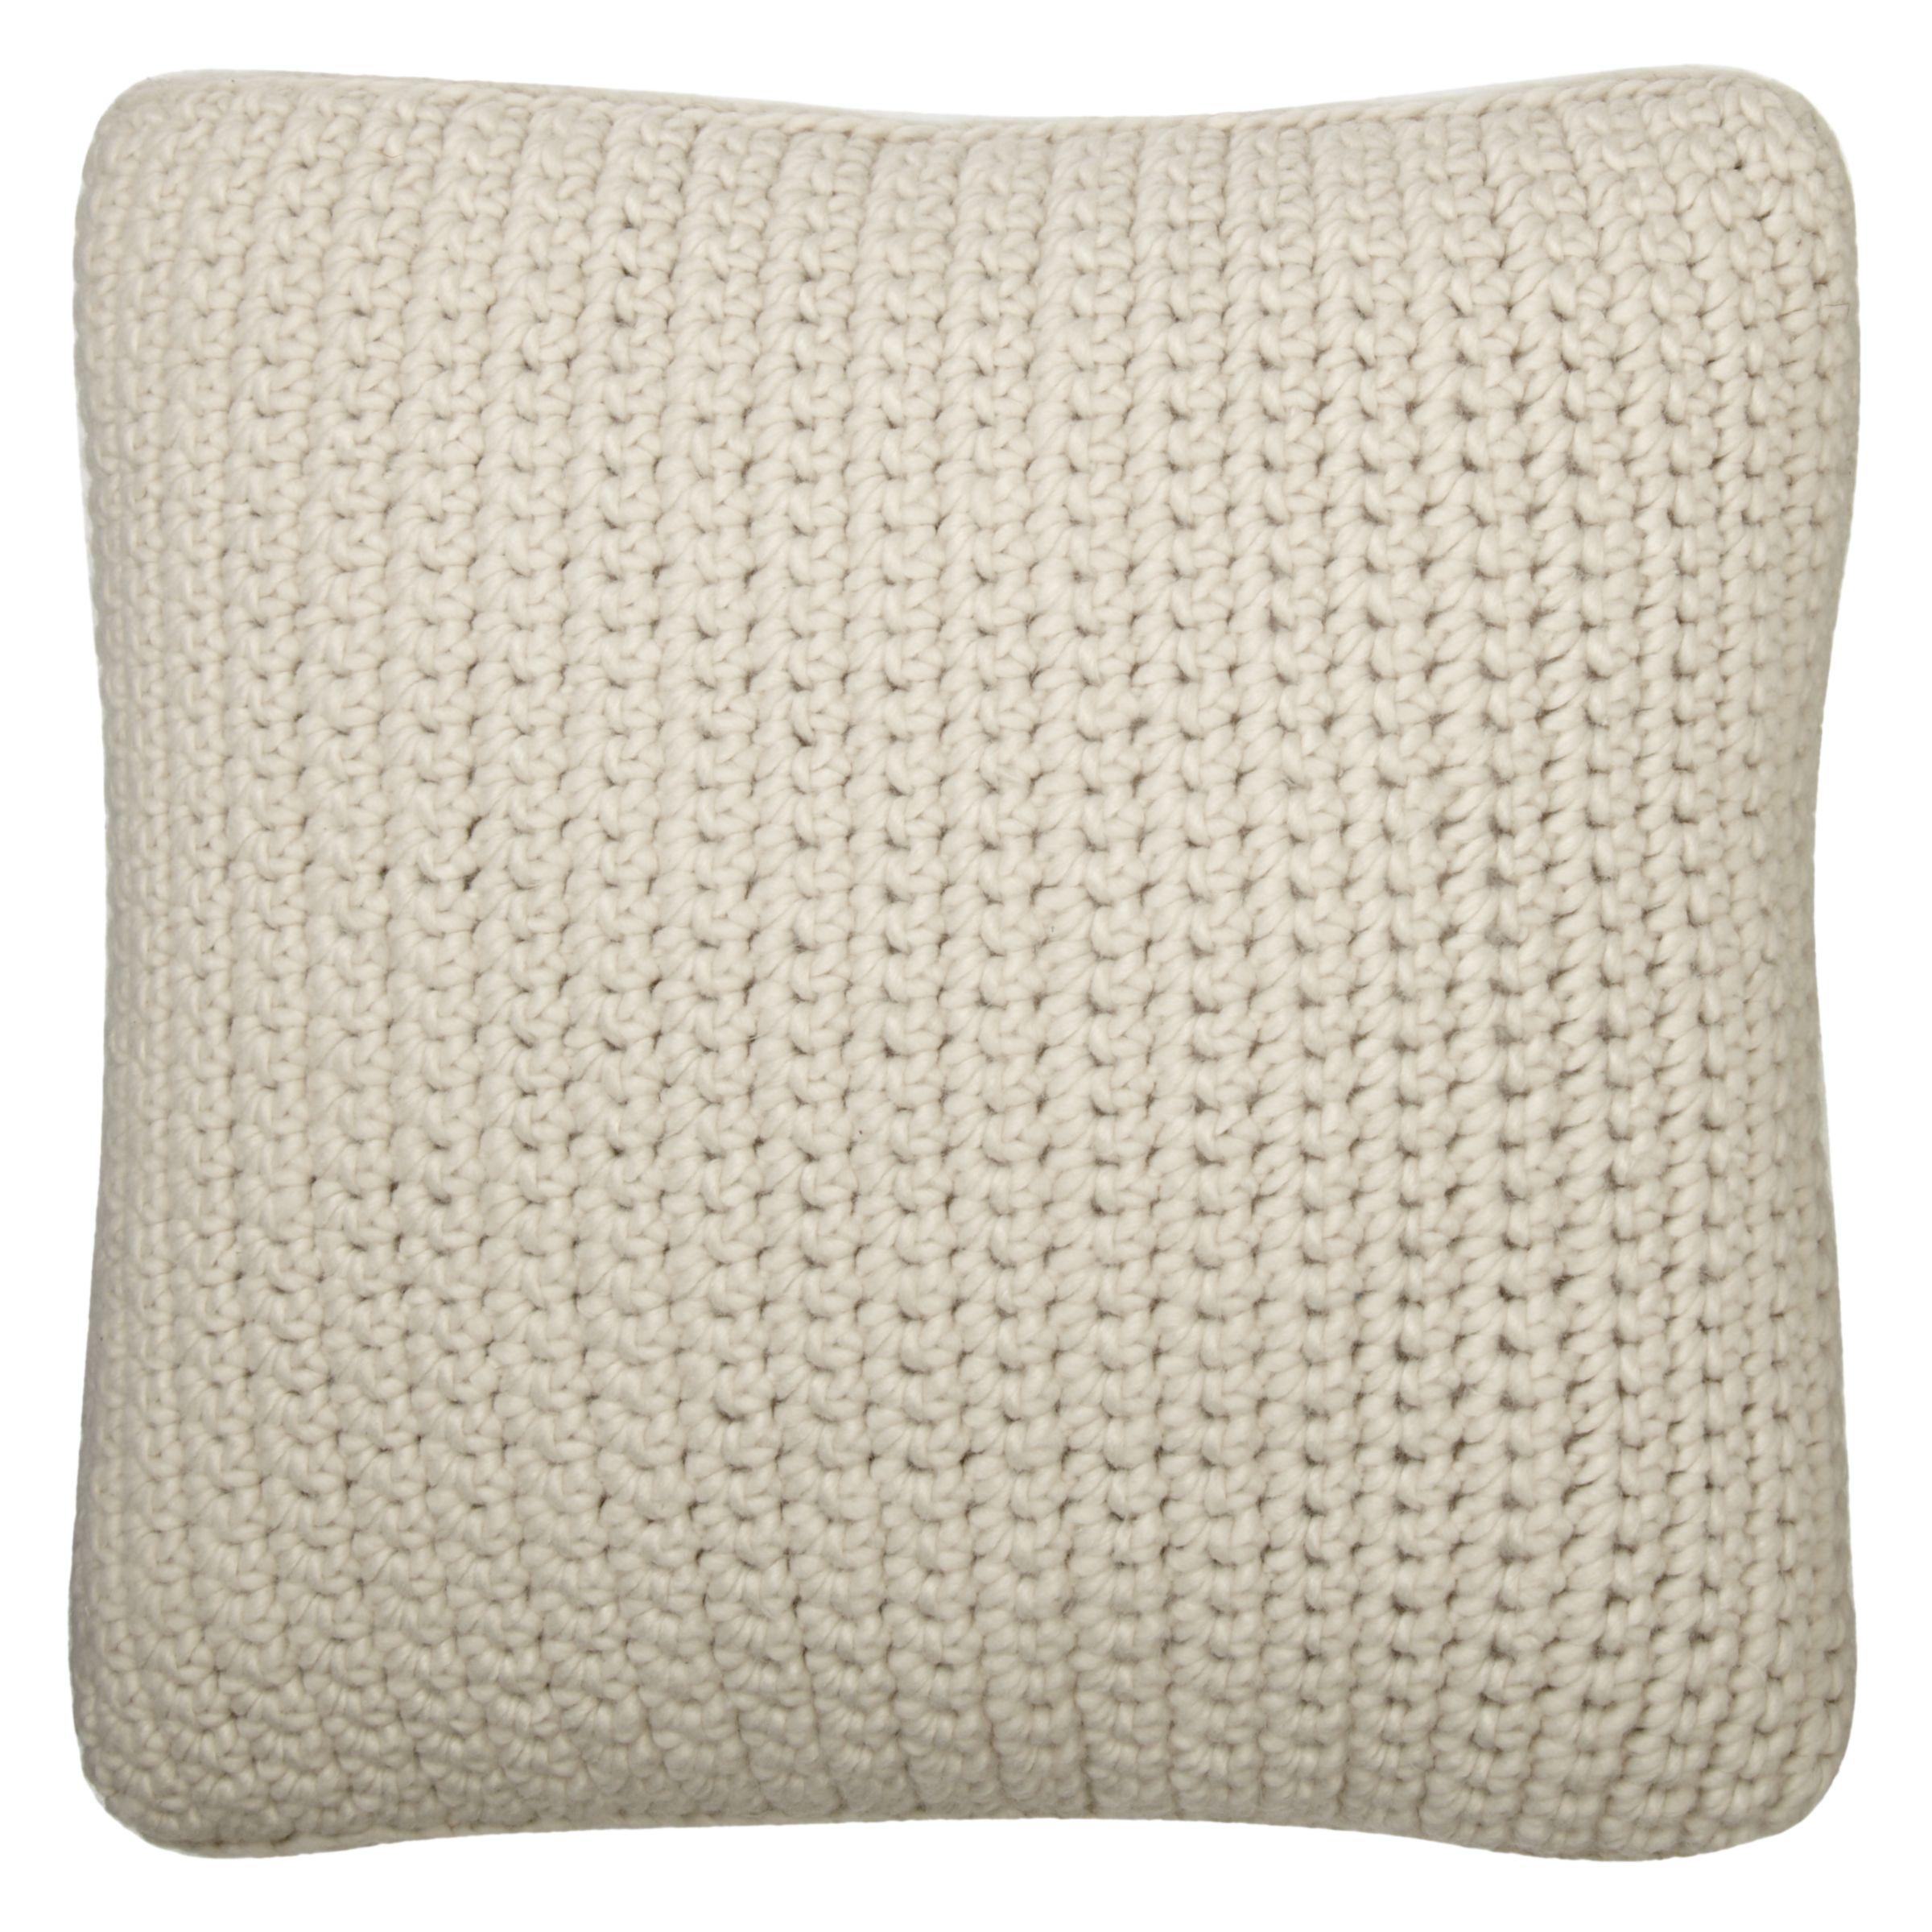 Buy John Lewis Croft Collection Flynn Ribbed Knit Cushion John Lewis